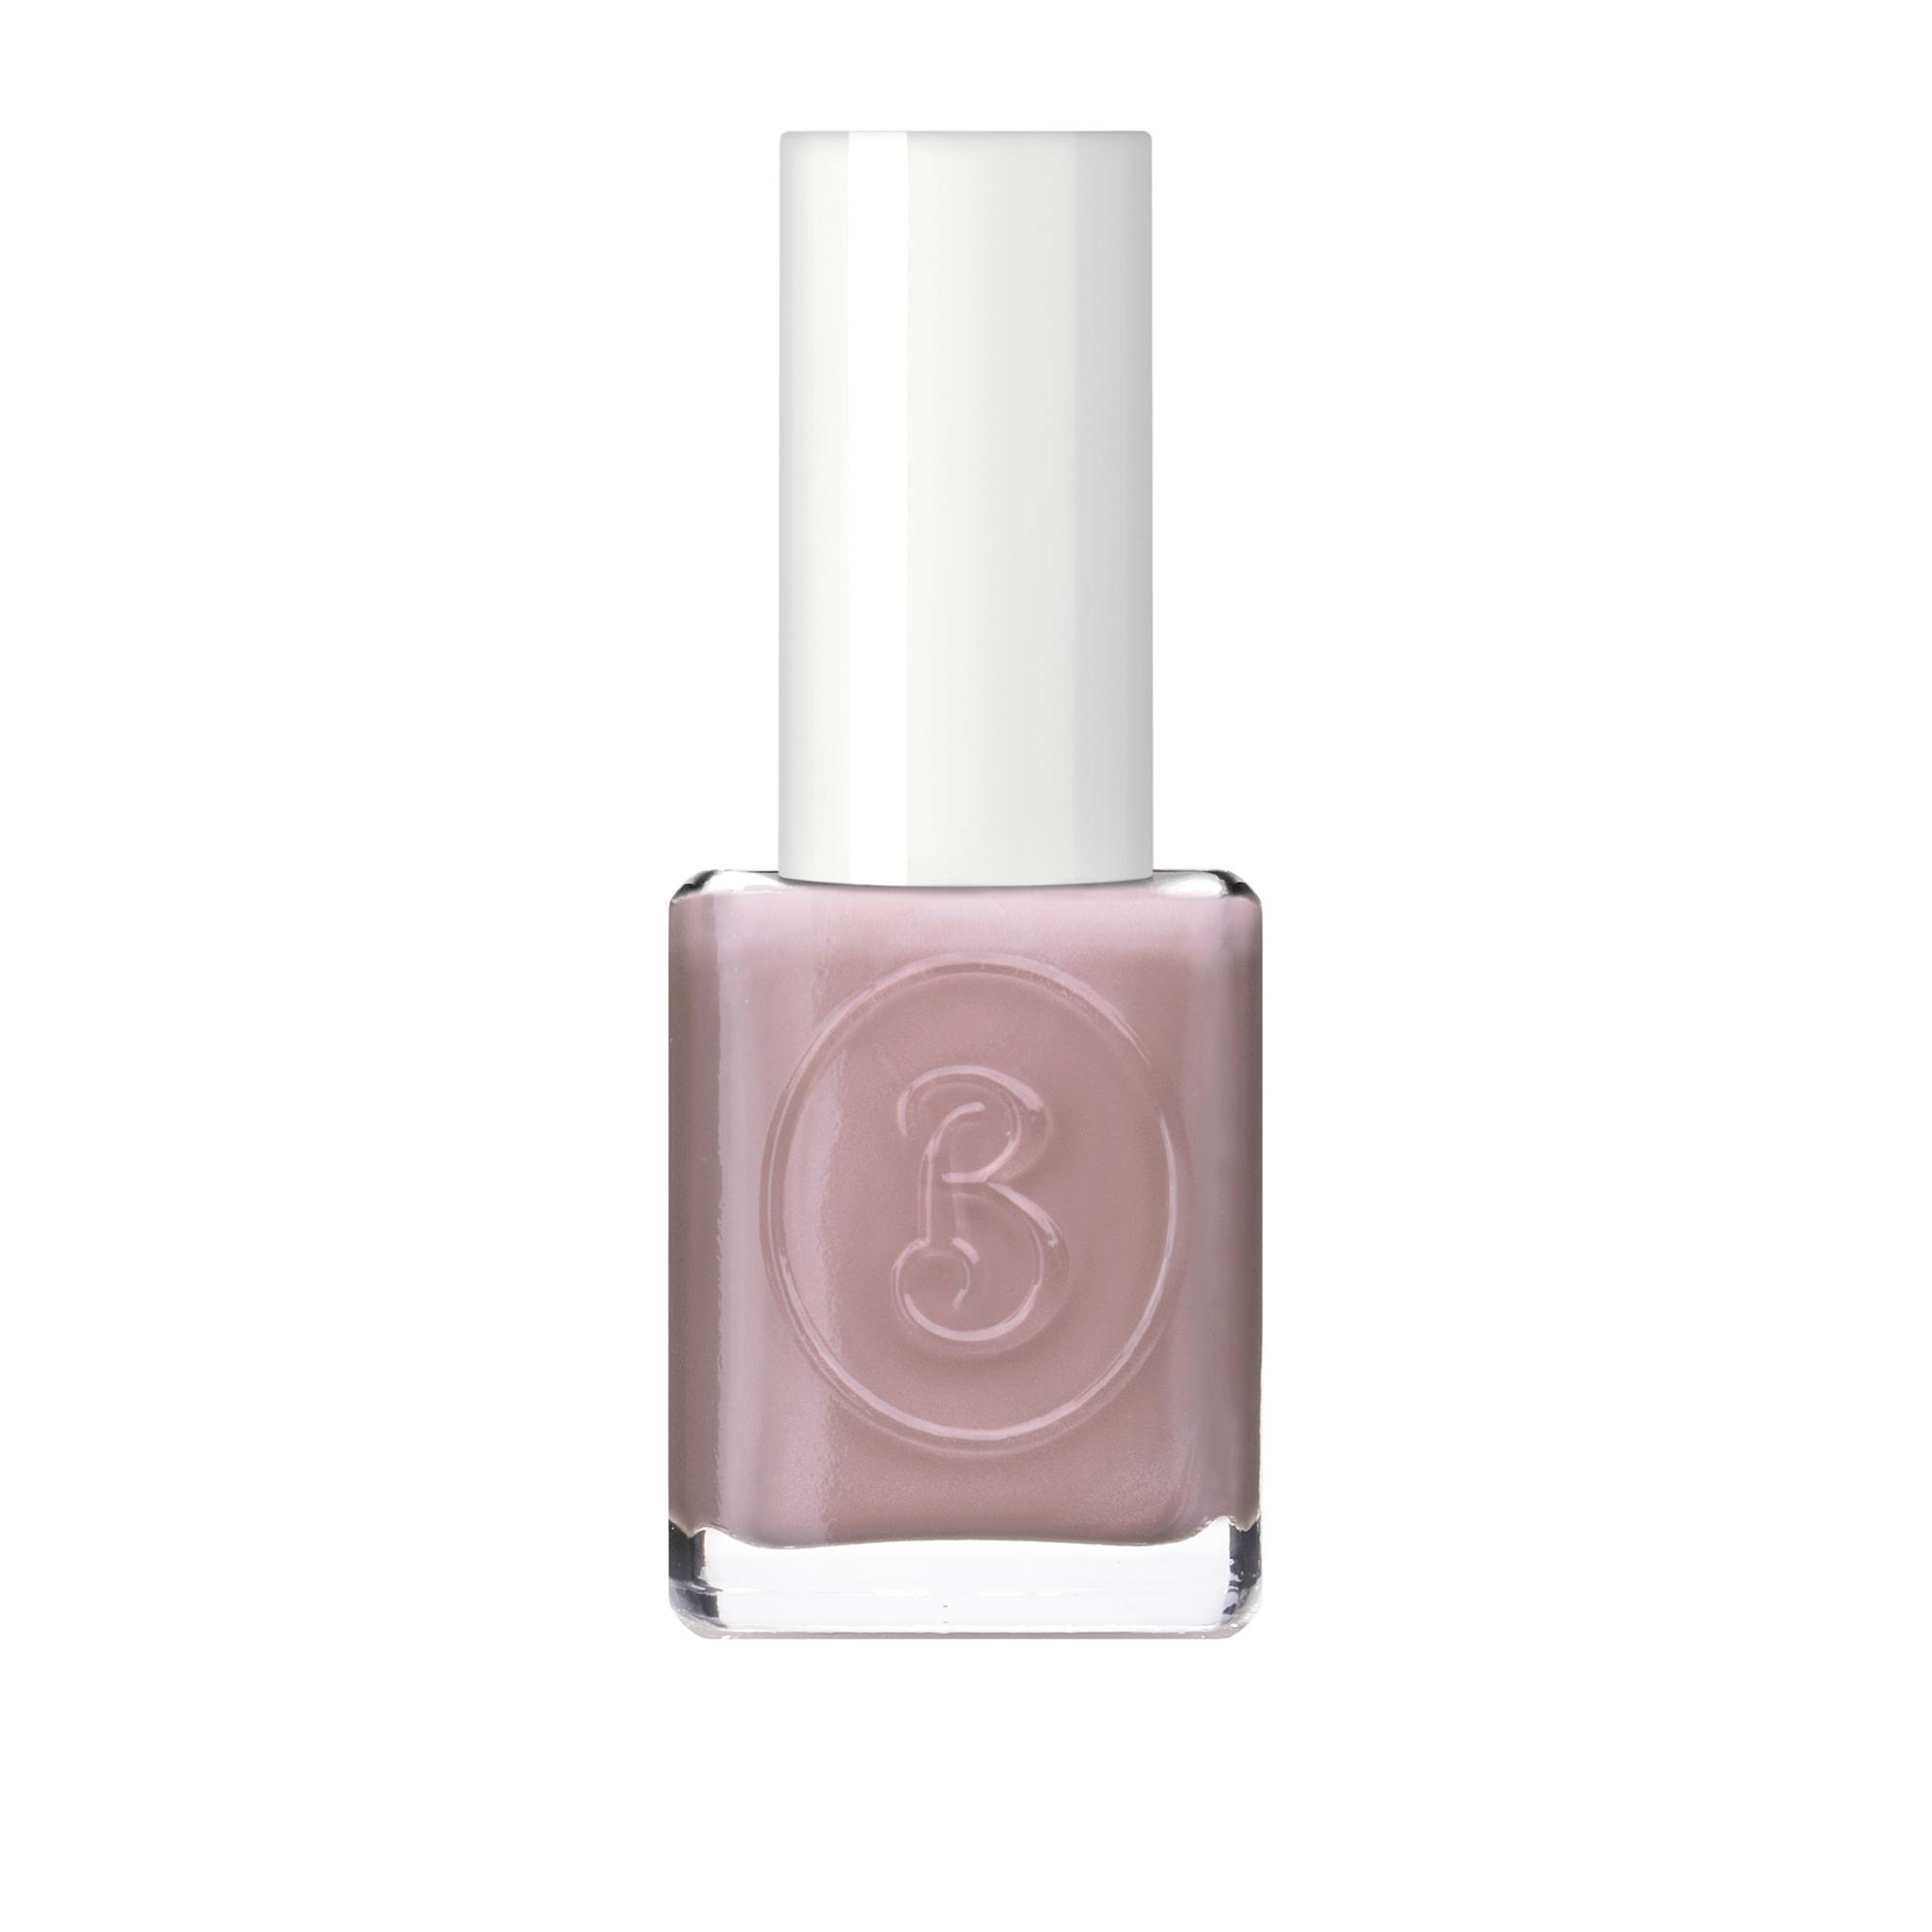 BERENICE 31 лак для ногтей, бутон розы / Rose bud 16 мл - Лаки